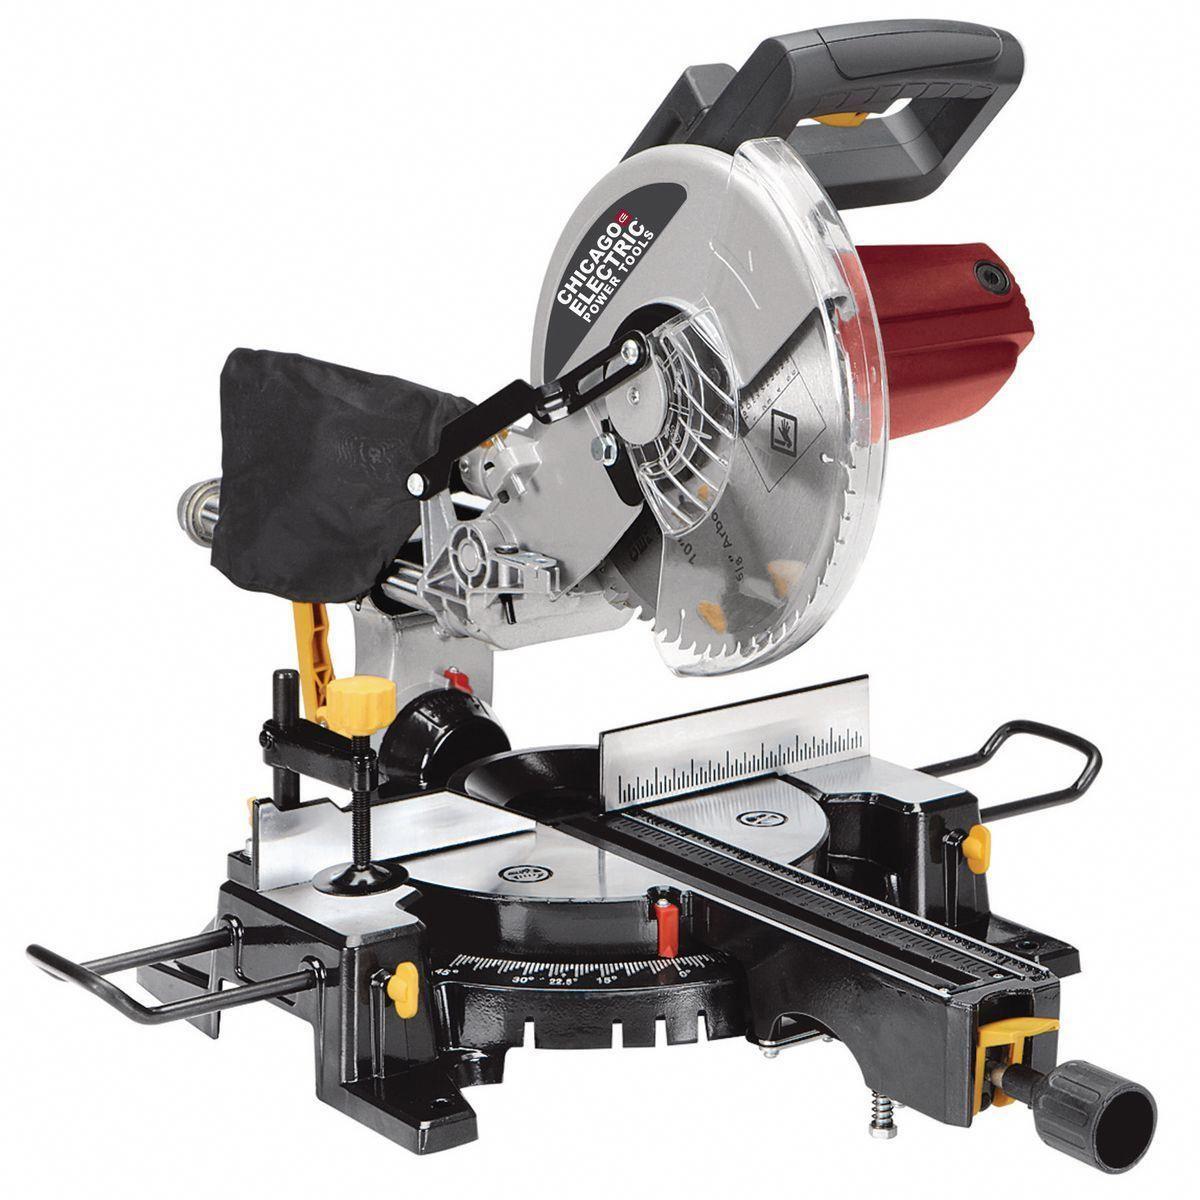 Setting Up Shop Hand Power Tools Sliding Compound Miter Saw Compound Mitre Saw Miter Saw